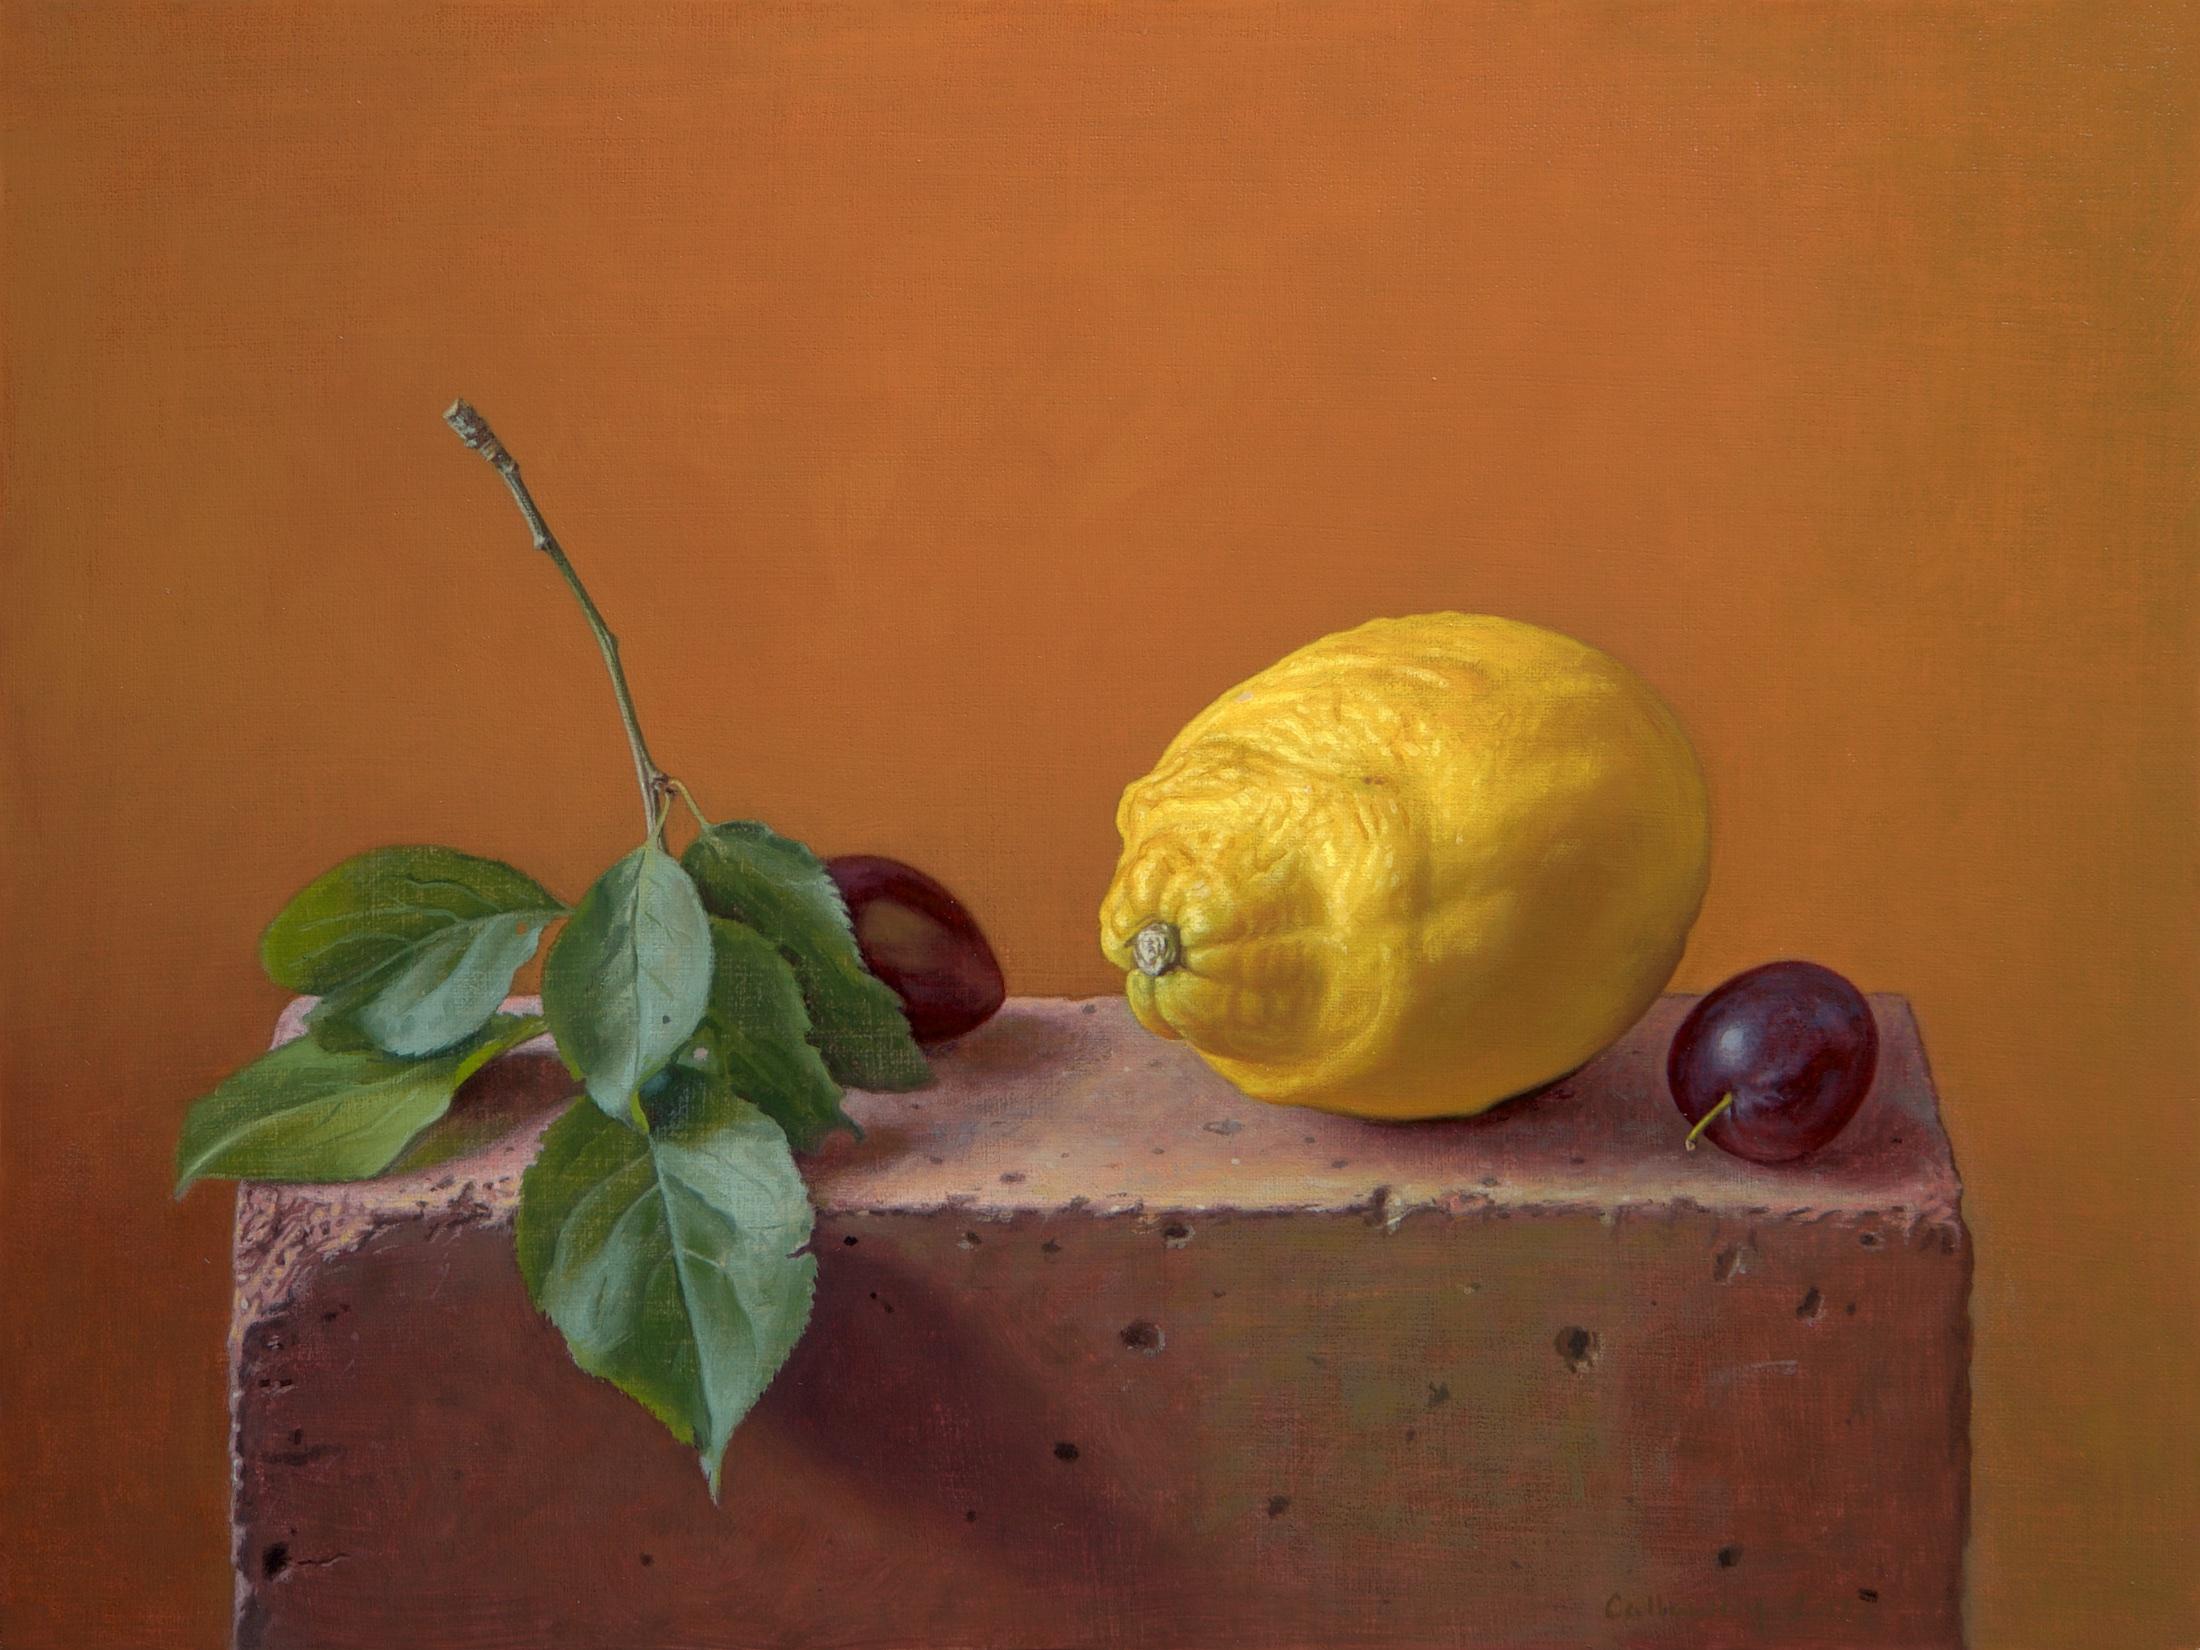 Alex Callaway, Lemon with Damsons on a Brick, Oil, 30cmx40cmx0.5cm,  http://www.alexcallaway.com